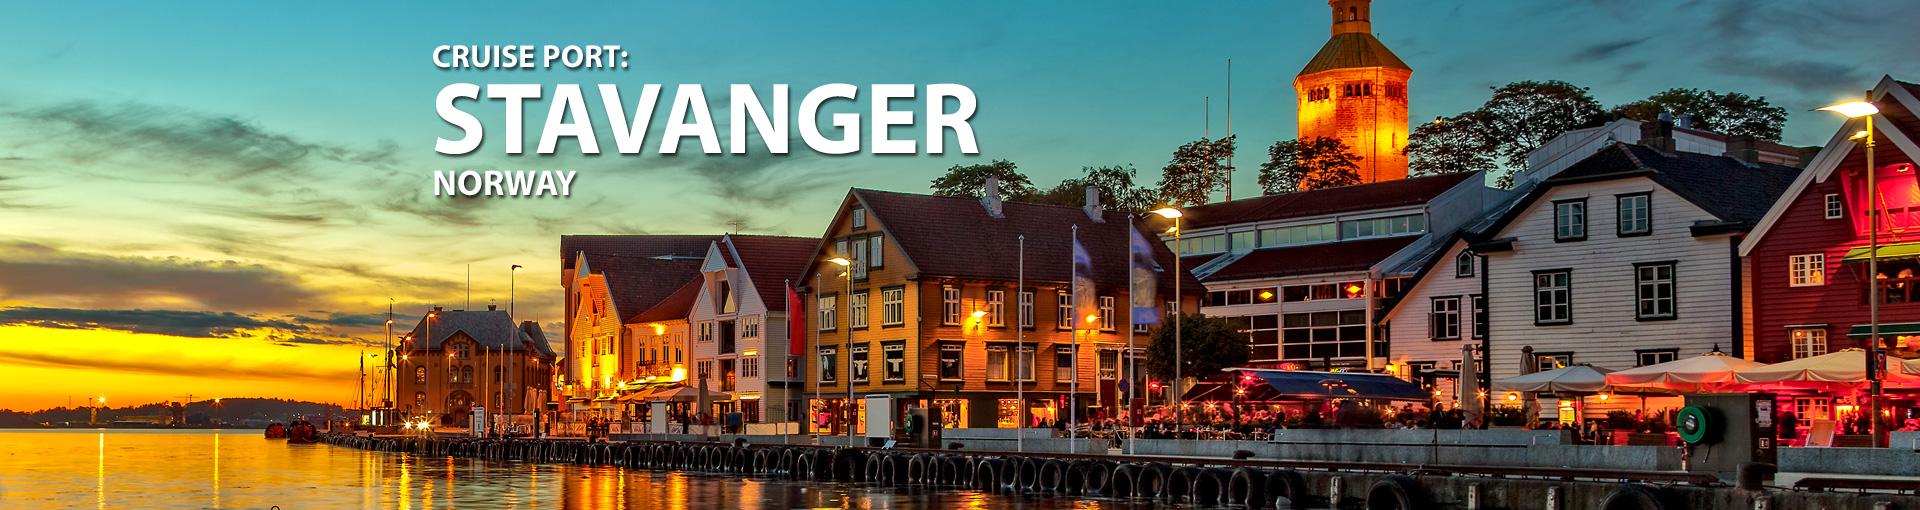 Cruises to Stavanger, Norway